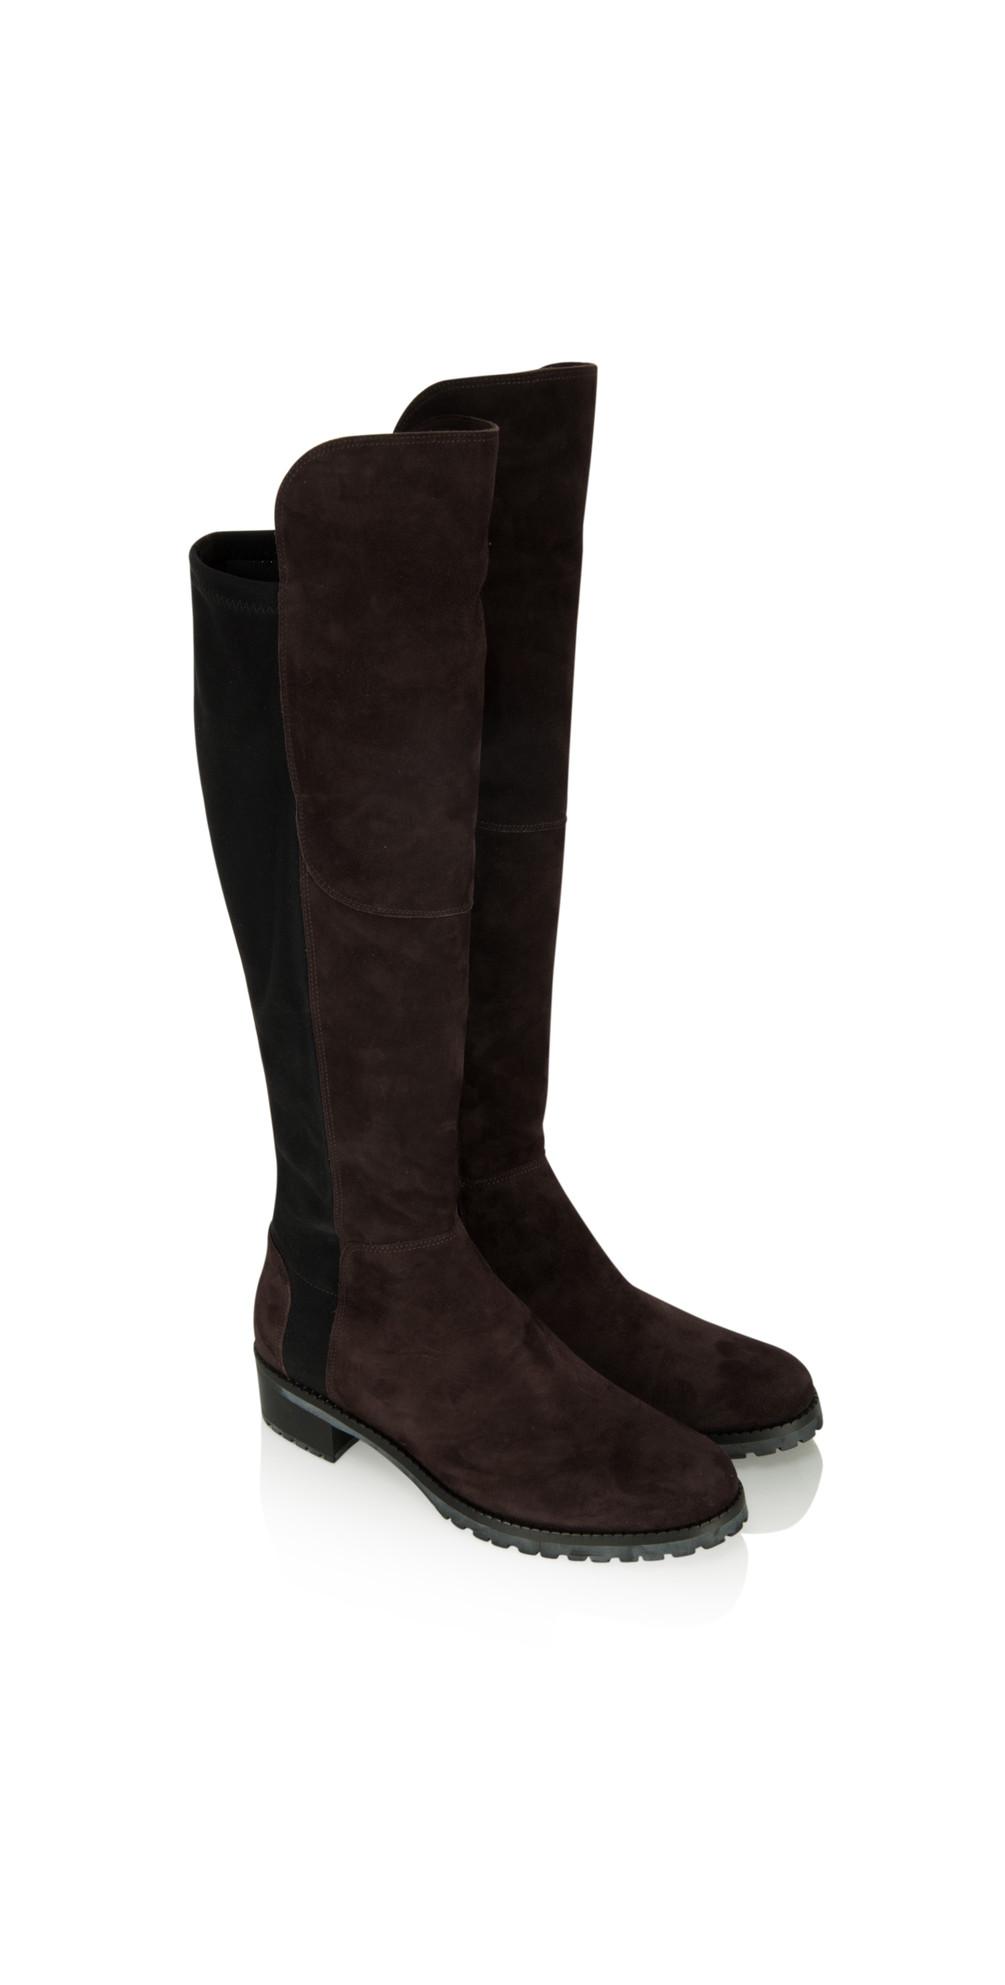 kennel und schmenger blues suede long flat boot in mocca. Black Bedroom Furniture Sets. Home Design Ideas